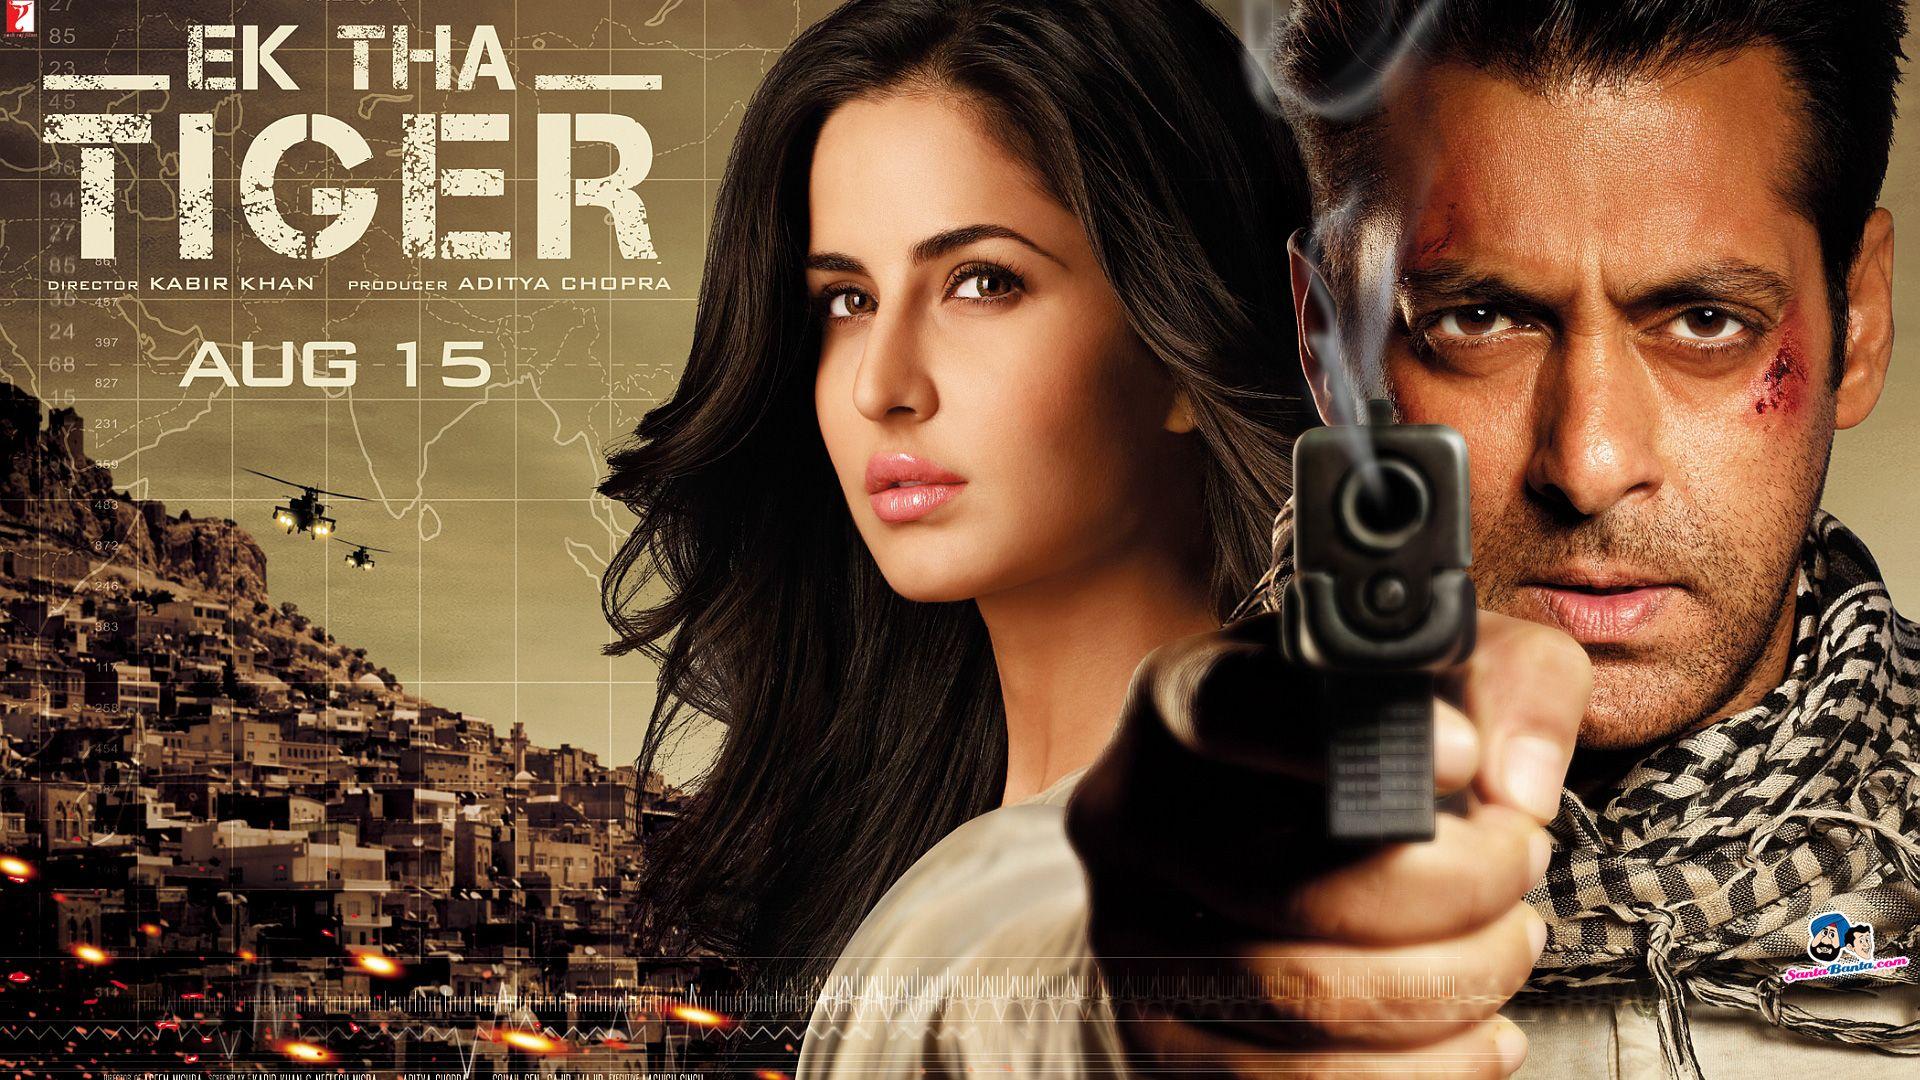 Ek Tha Tiger 2012 Cine Bollywood Ek Tha Tiger Peliculas Online Gratis Cine Online